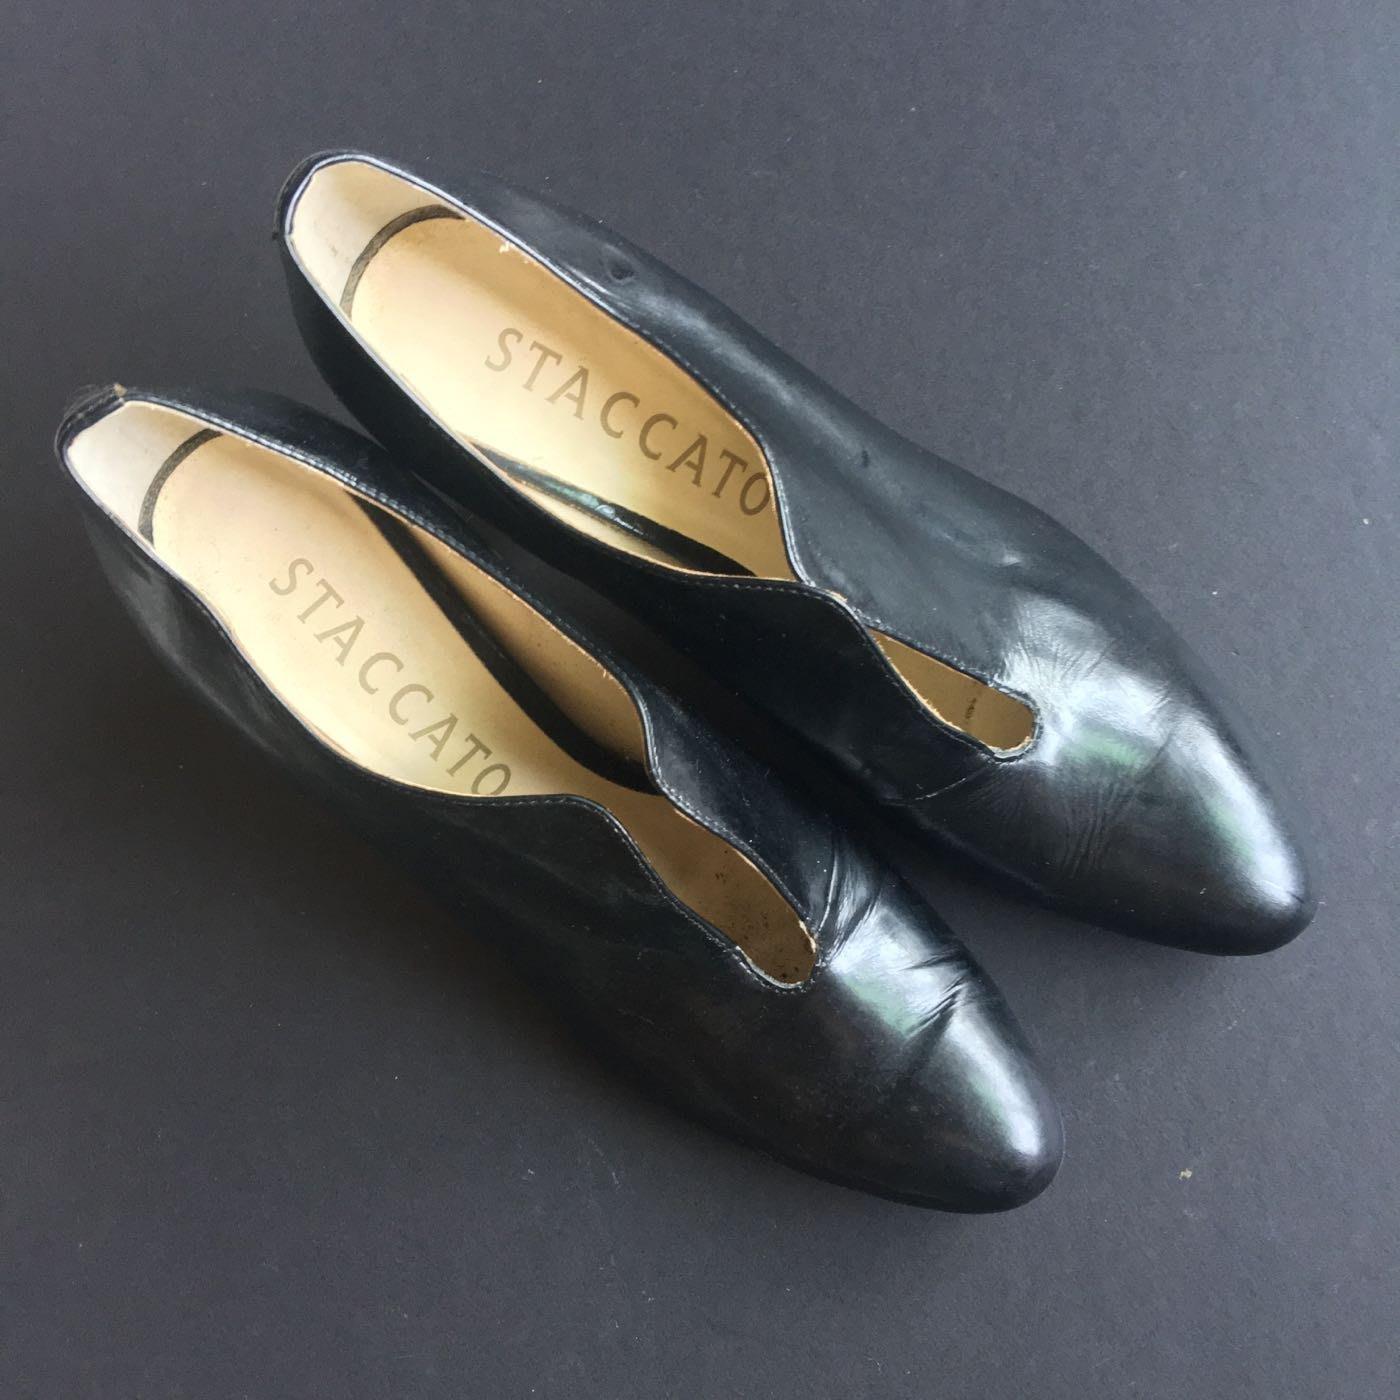 Staccato 高跟鞋👠.正品約2.2折.手工鞋皮質很好.正式場合穿很漂亮!💎💎💎